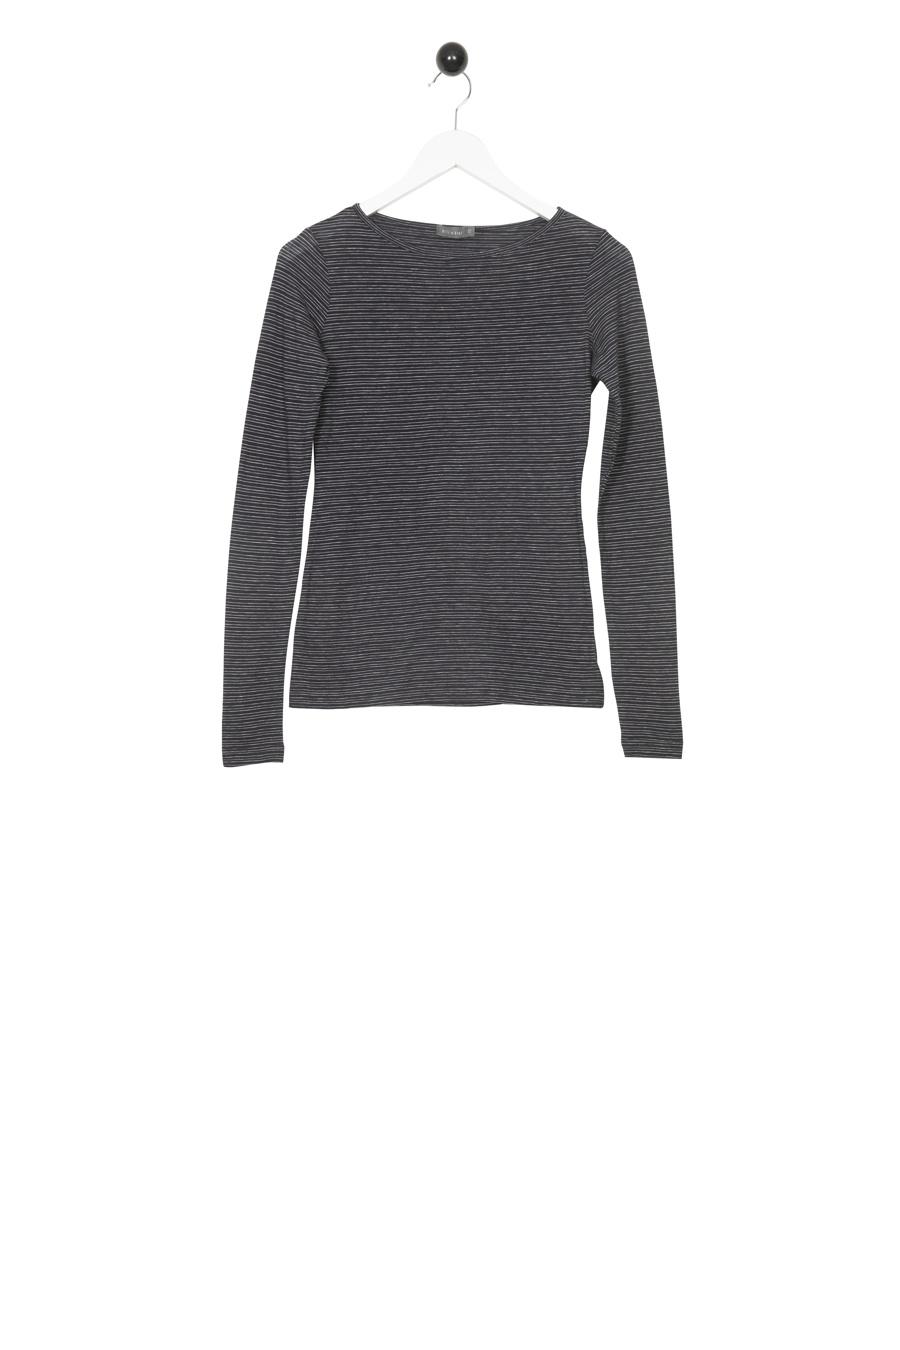 Return Mejram Sweater